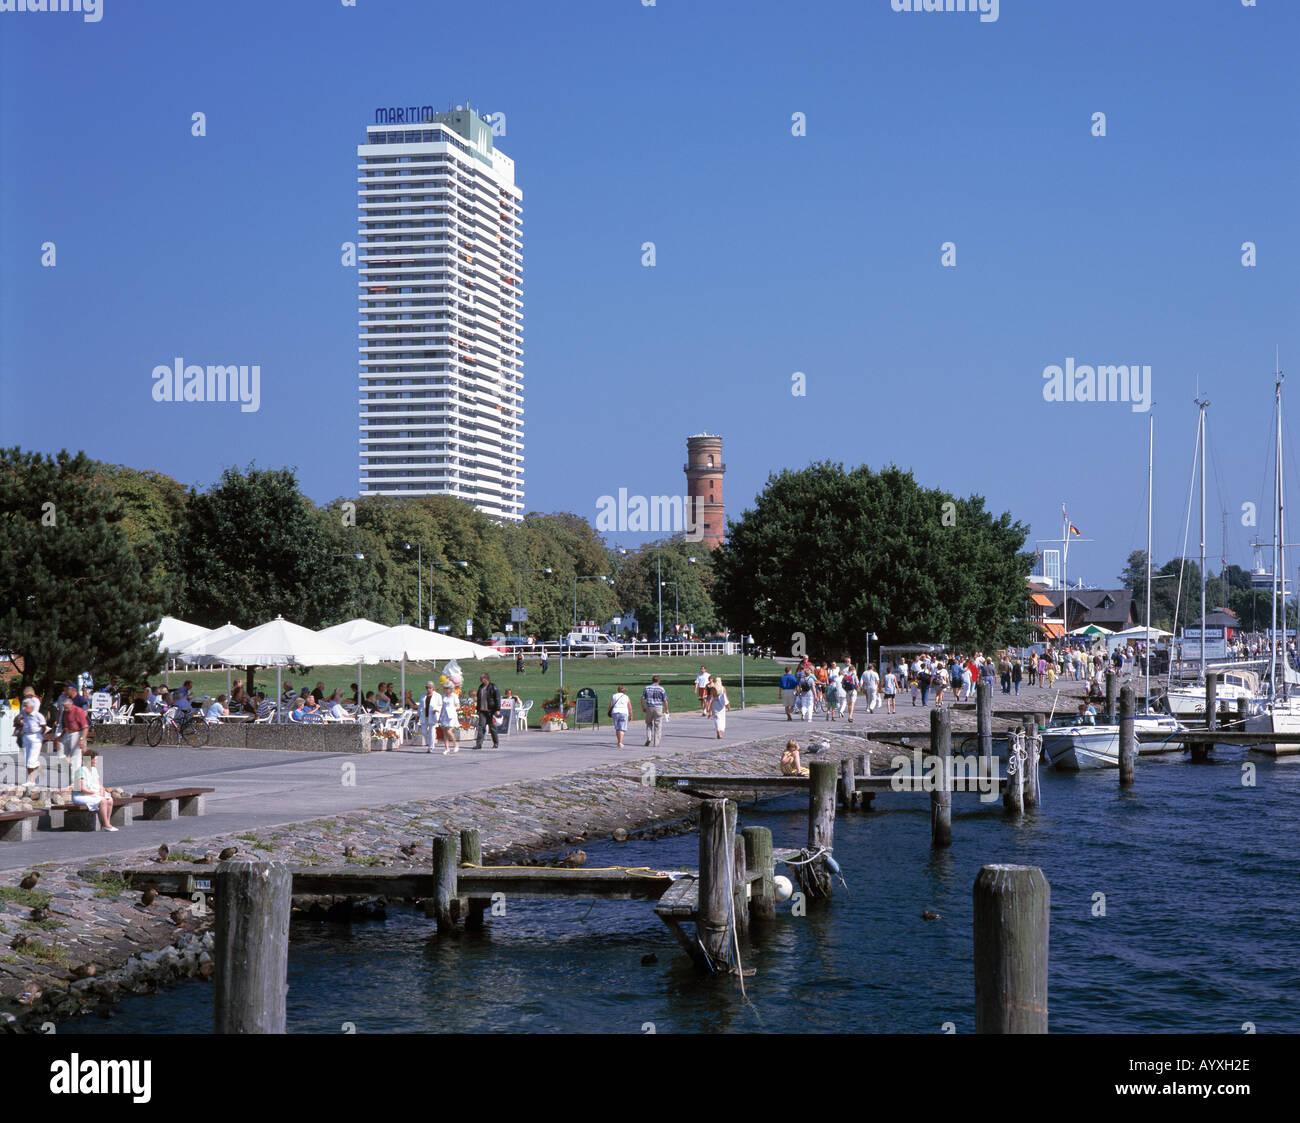 strandpromenade maritim hotel und alter leuchtturm stock. Black Bedroom Furniture Sets. Home Design Ideas